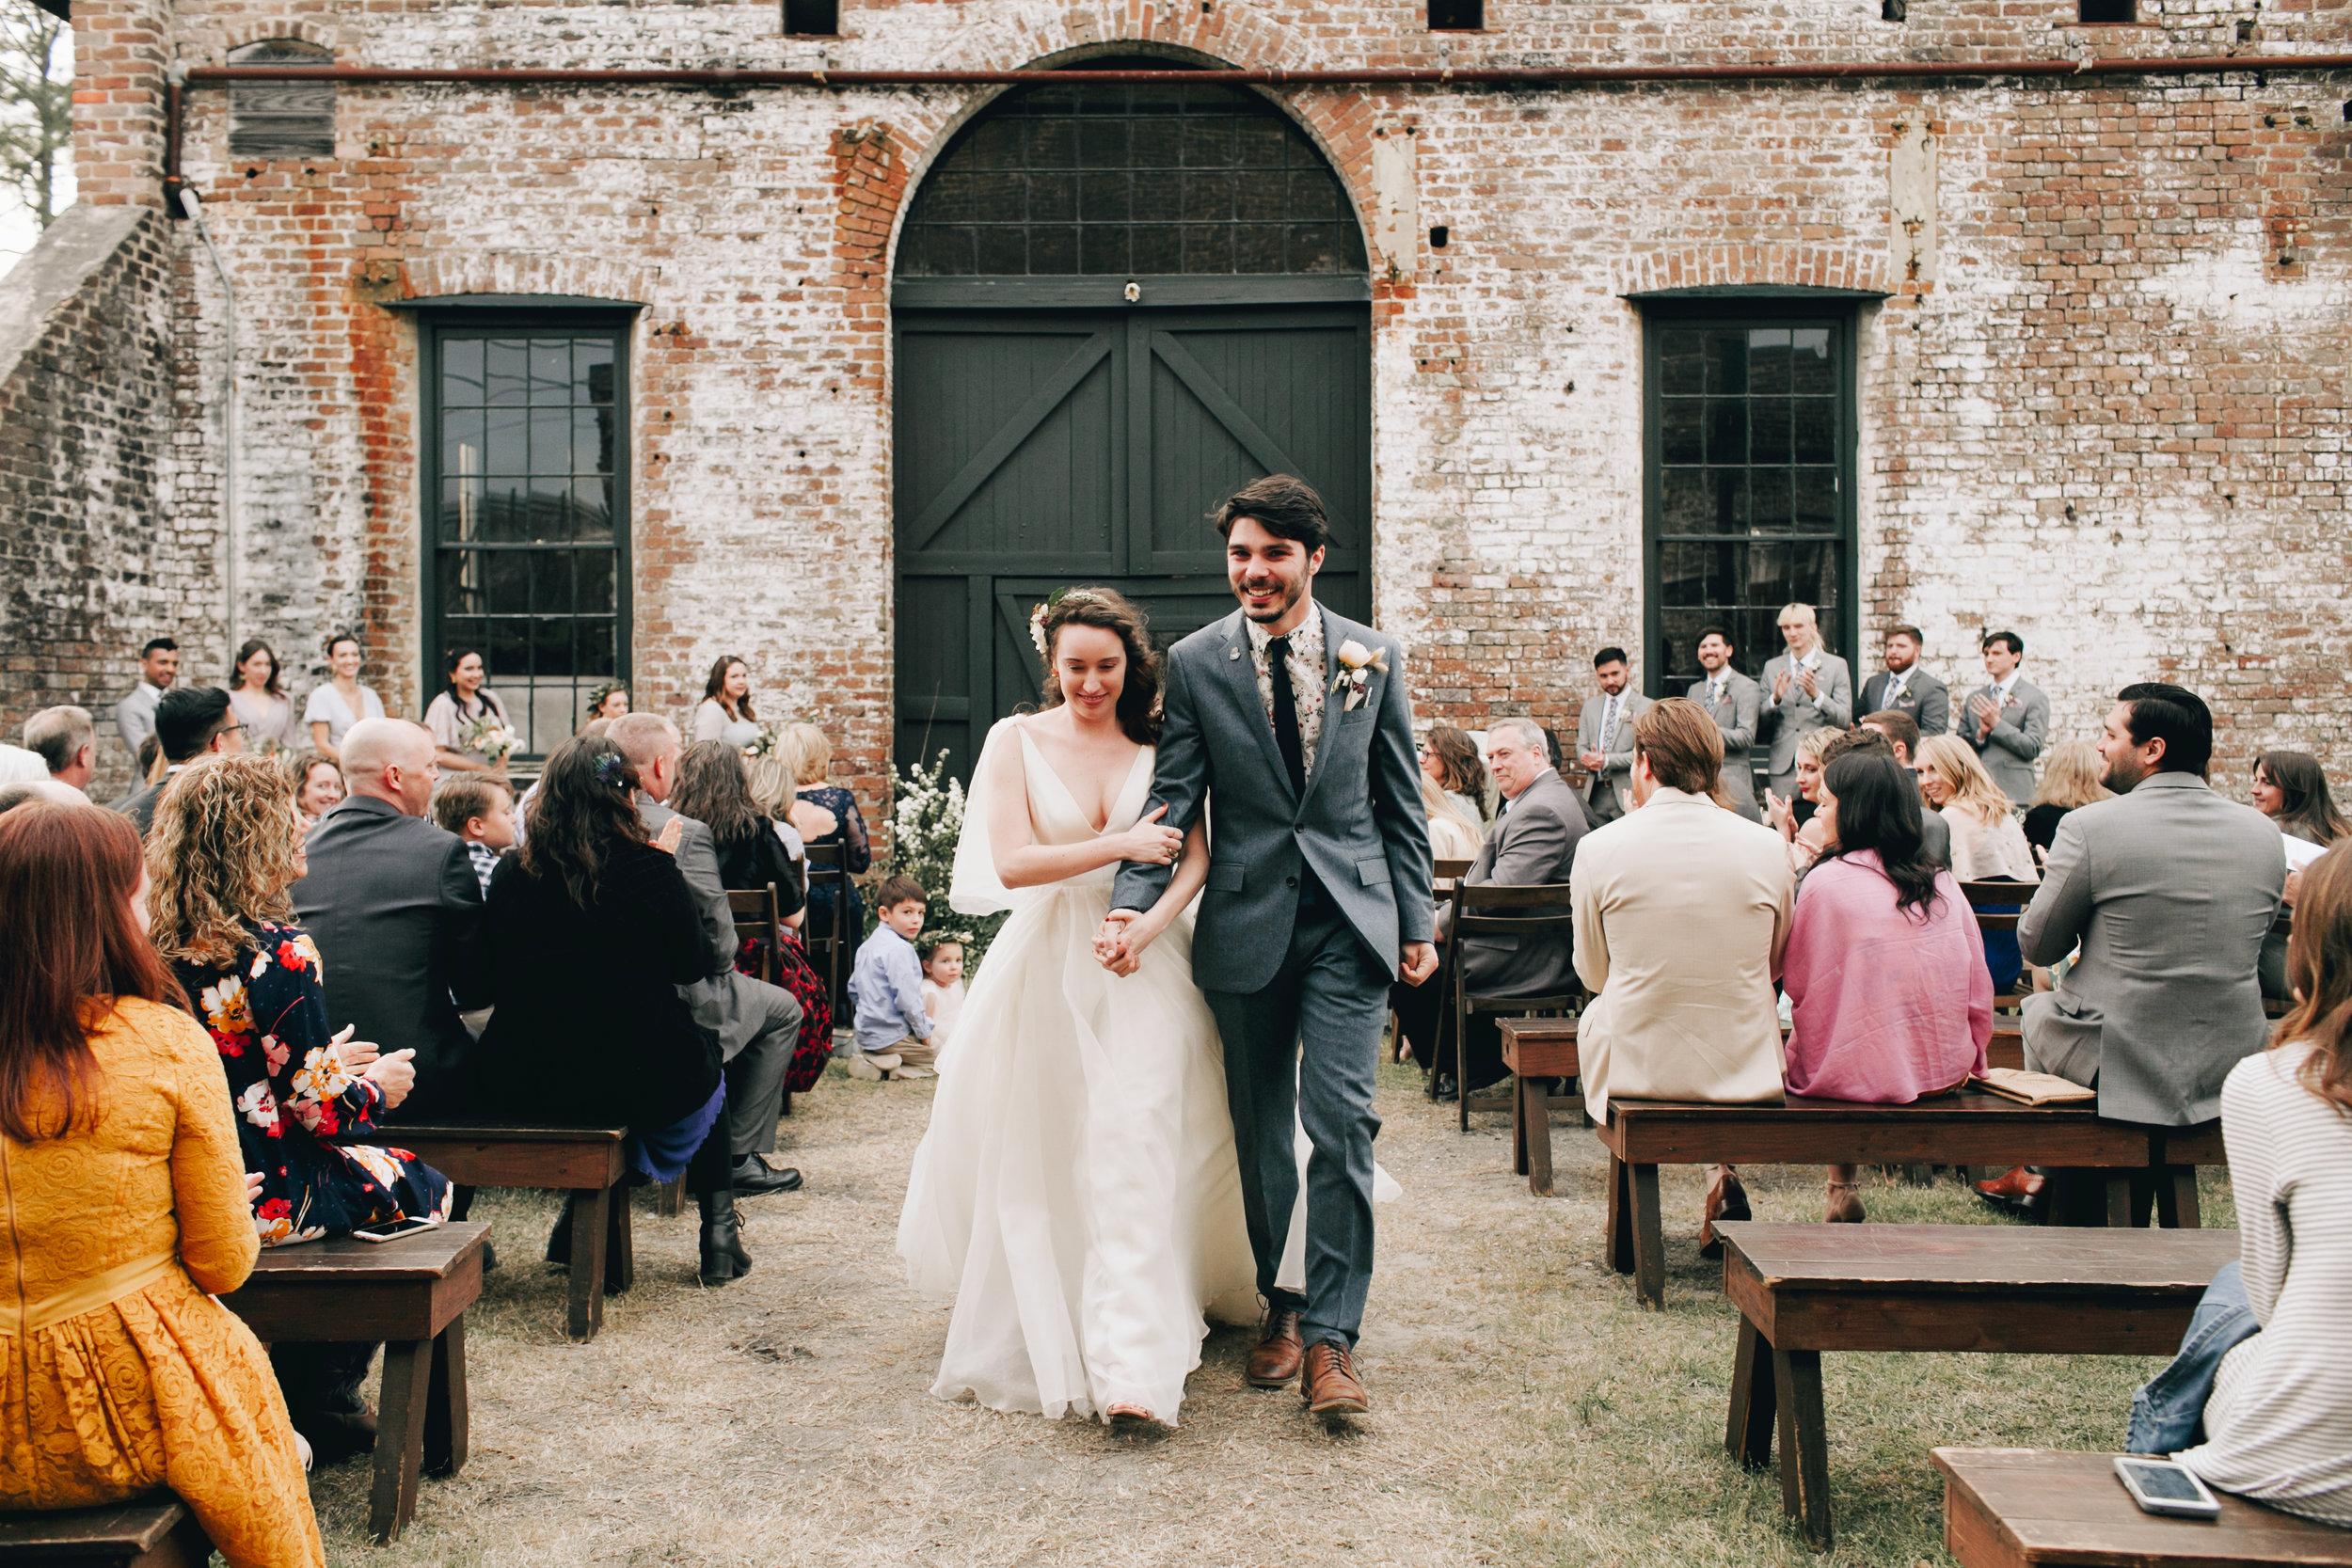 Photography Anthology - Savannah Wedding at Georgia State Railroad Museum (134 of 198).jpg